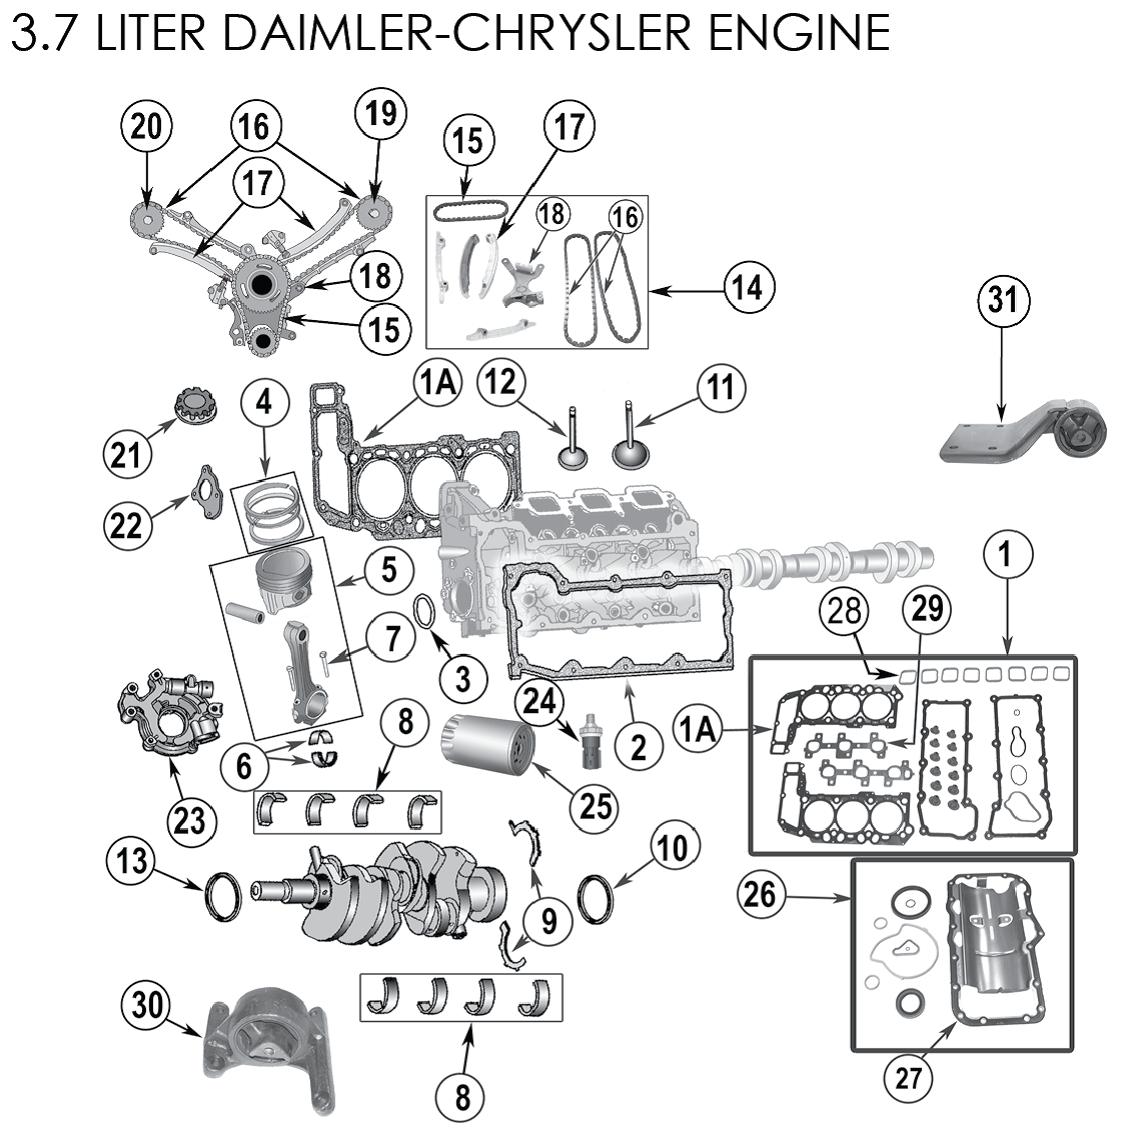 1999 2009 jeep grand cherokee wj wk exhaust parts photos